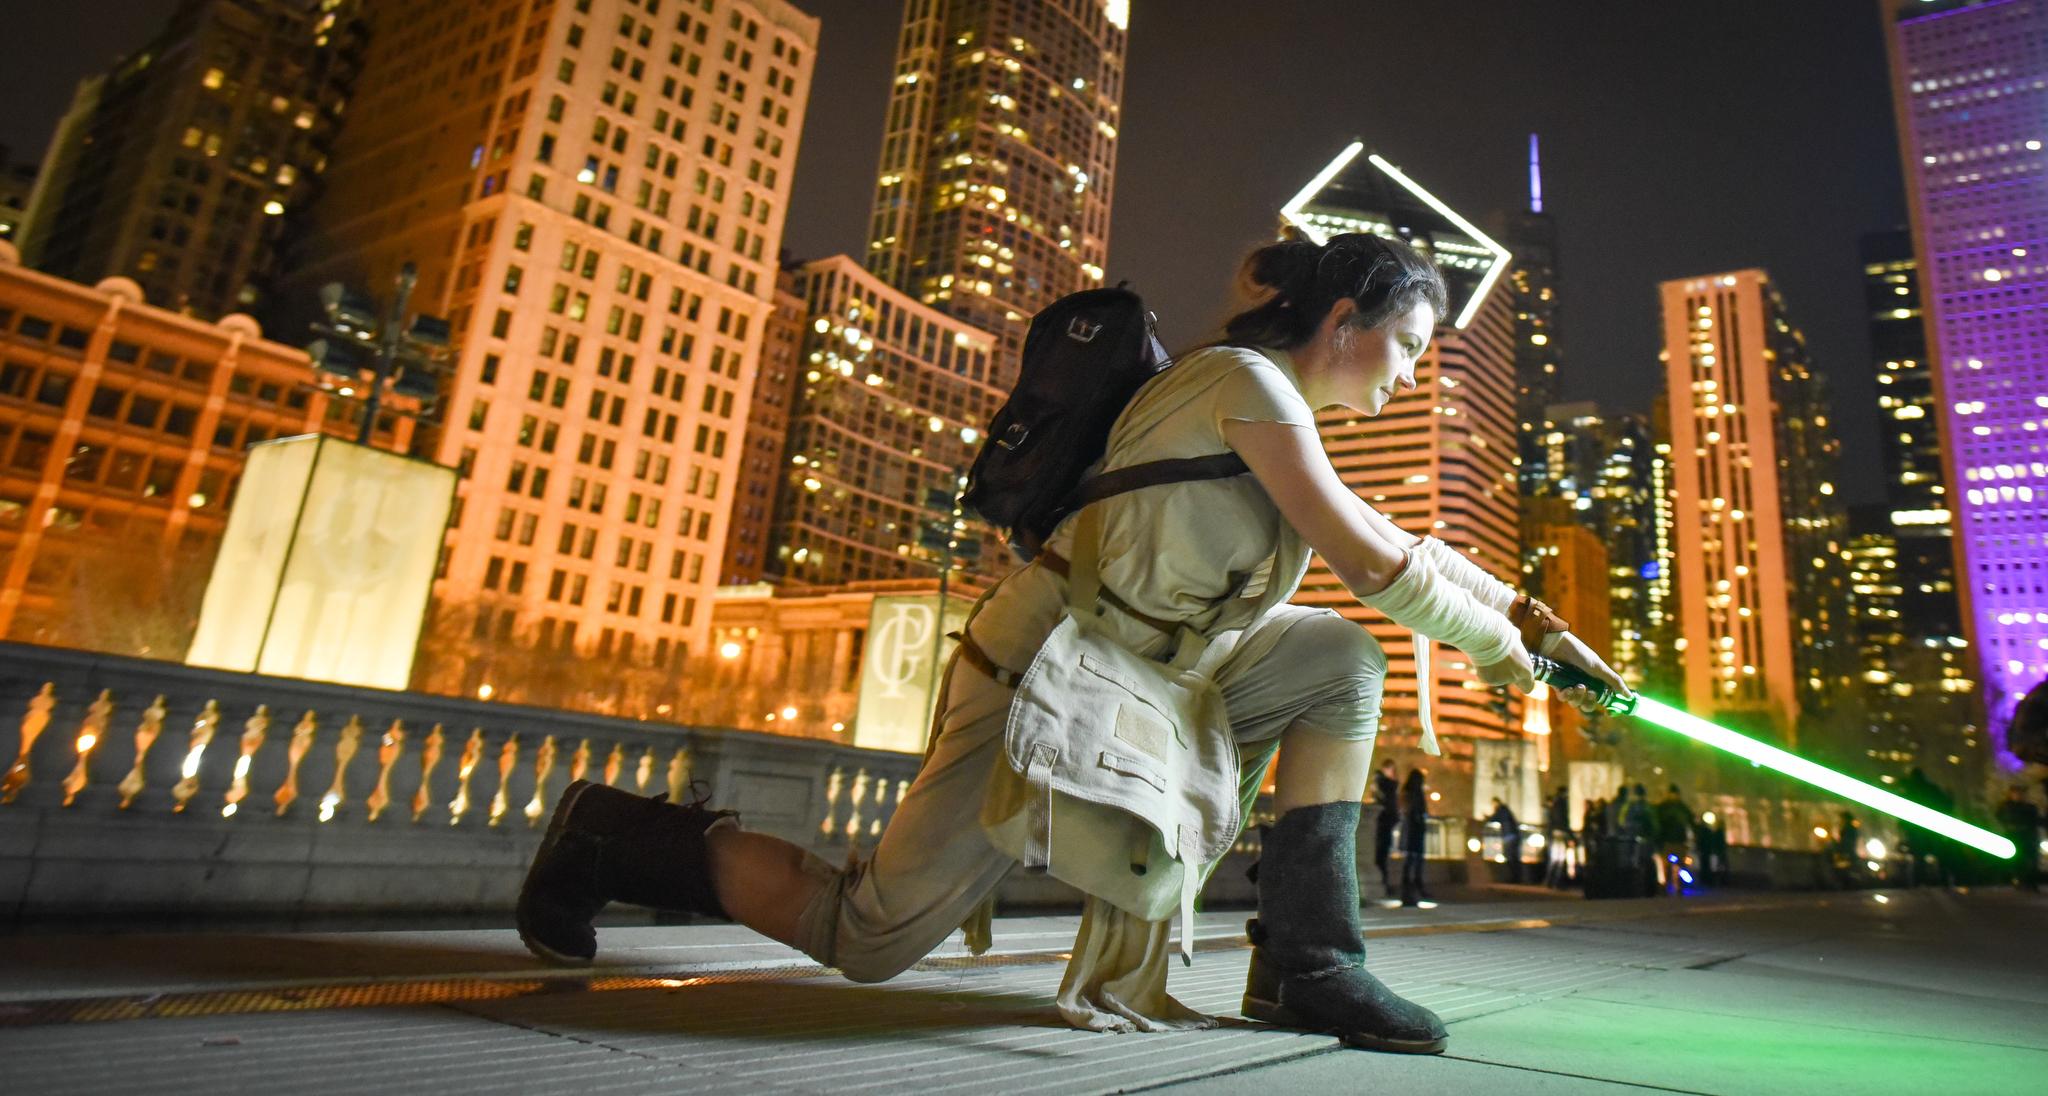 2019.04.14 - Star Wars Celebration Chicago 288894.JPG